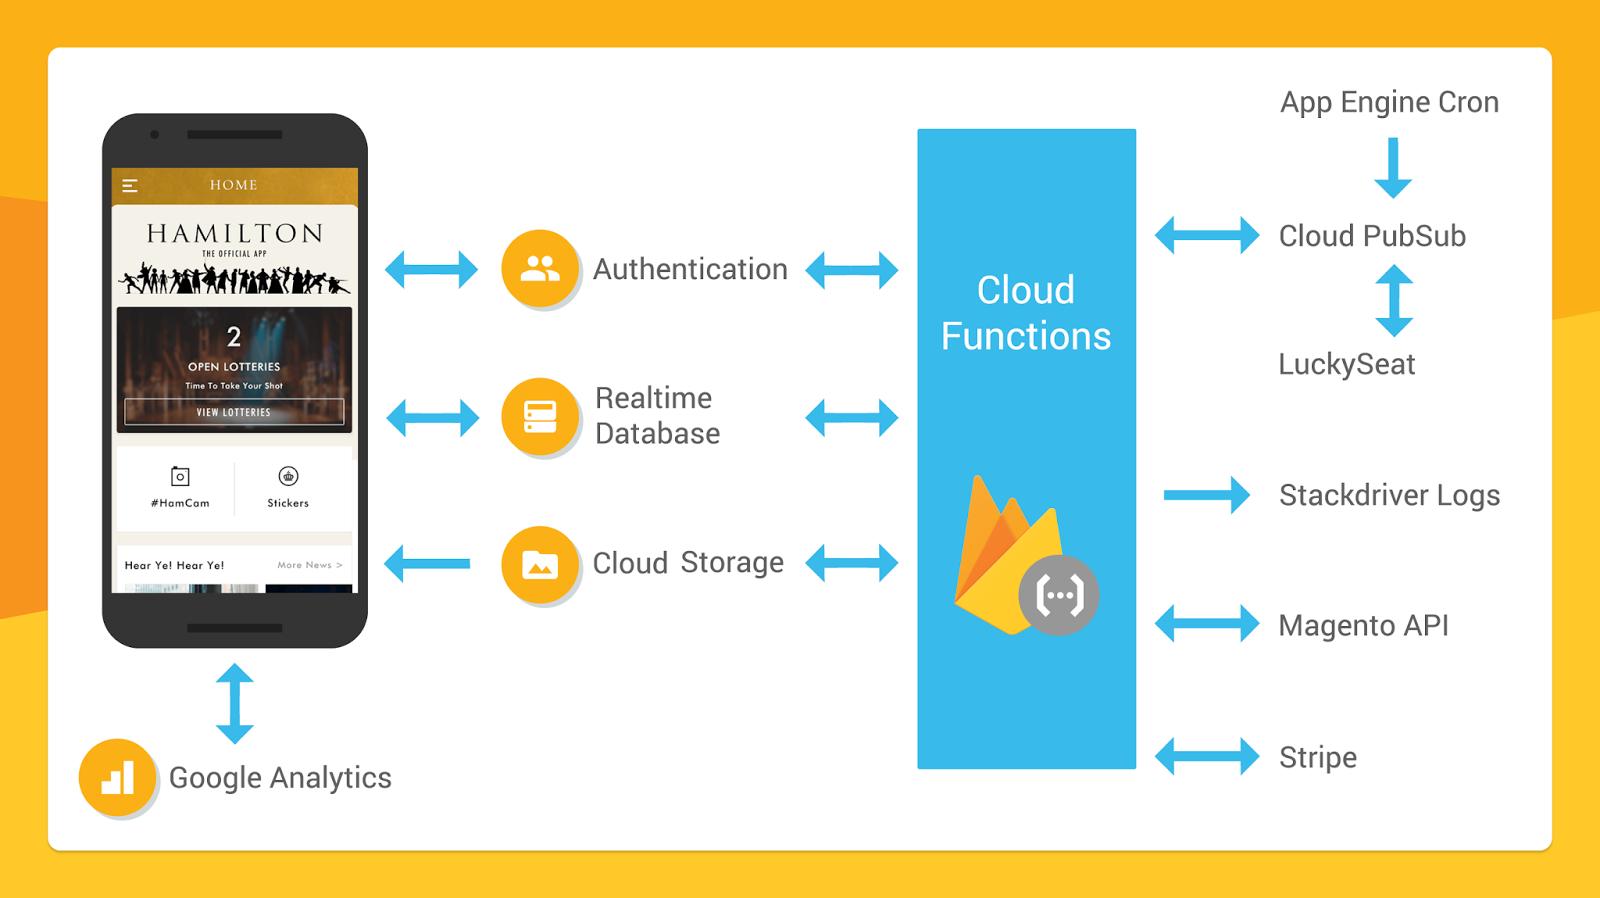 Google Developers Blog: Hamilton App Takes the Stage